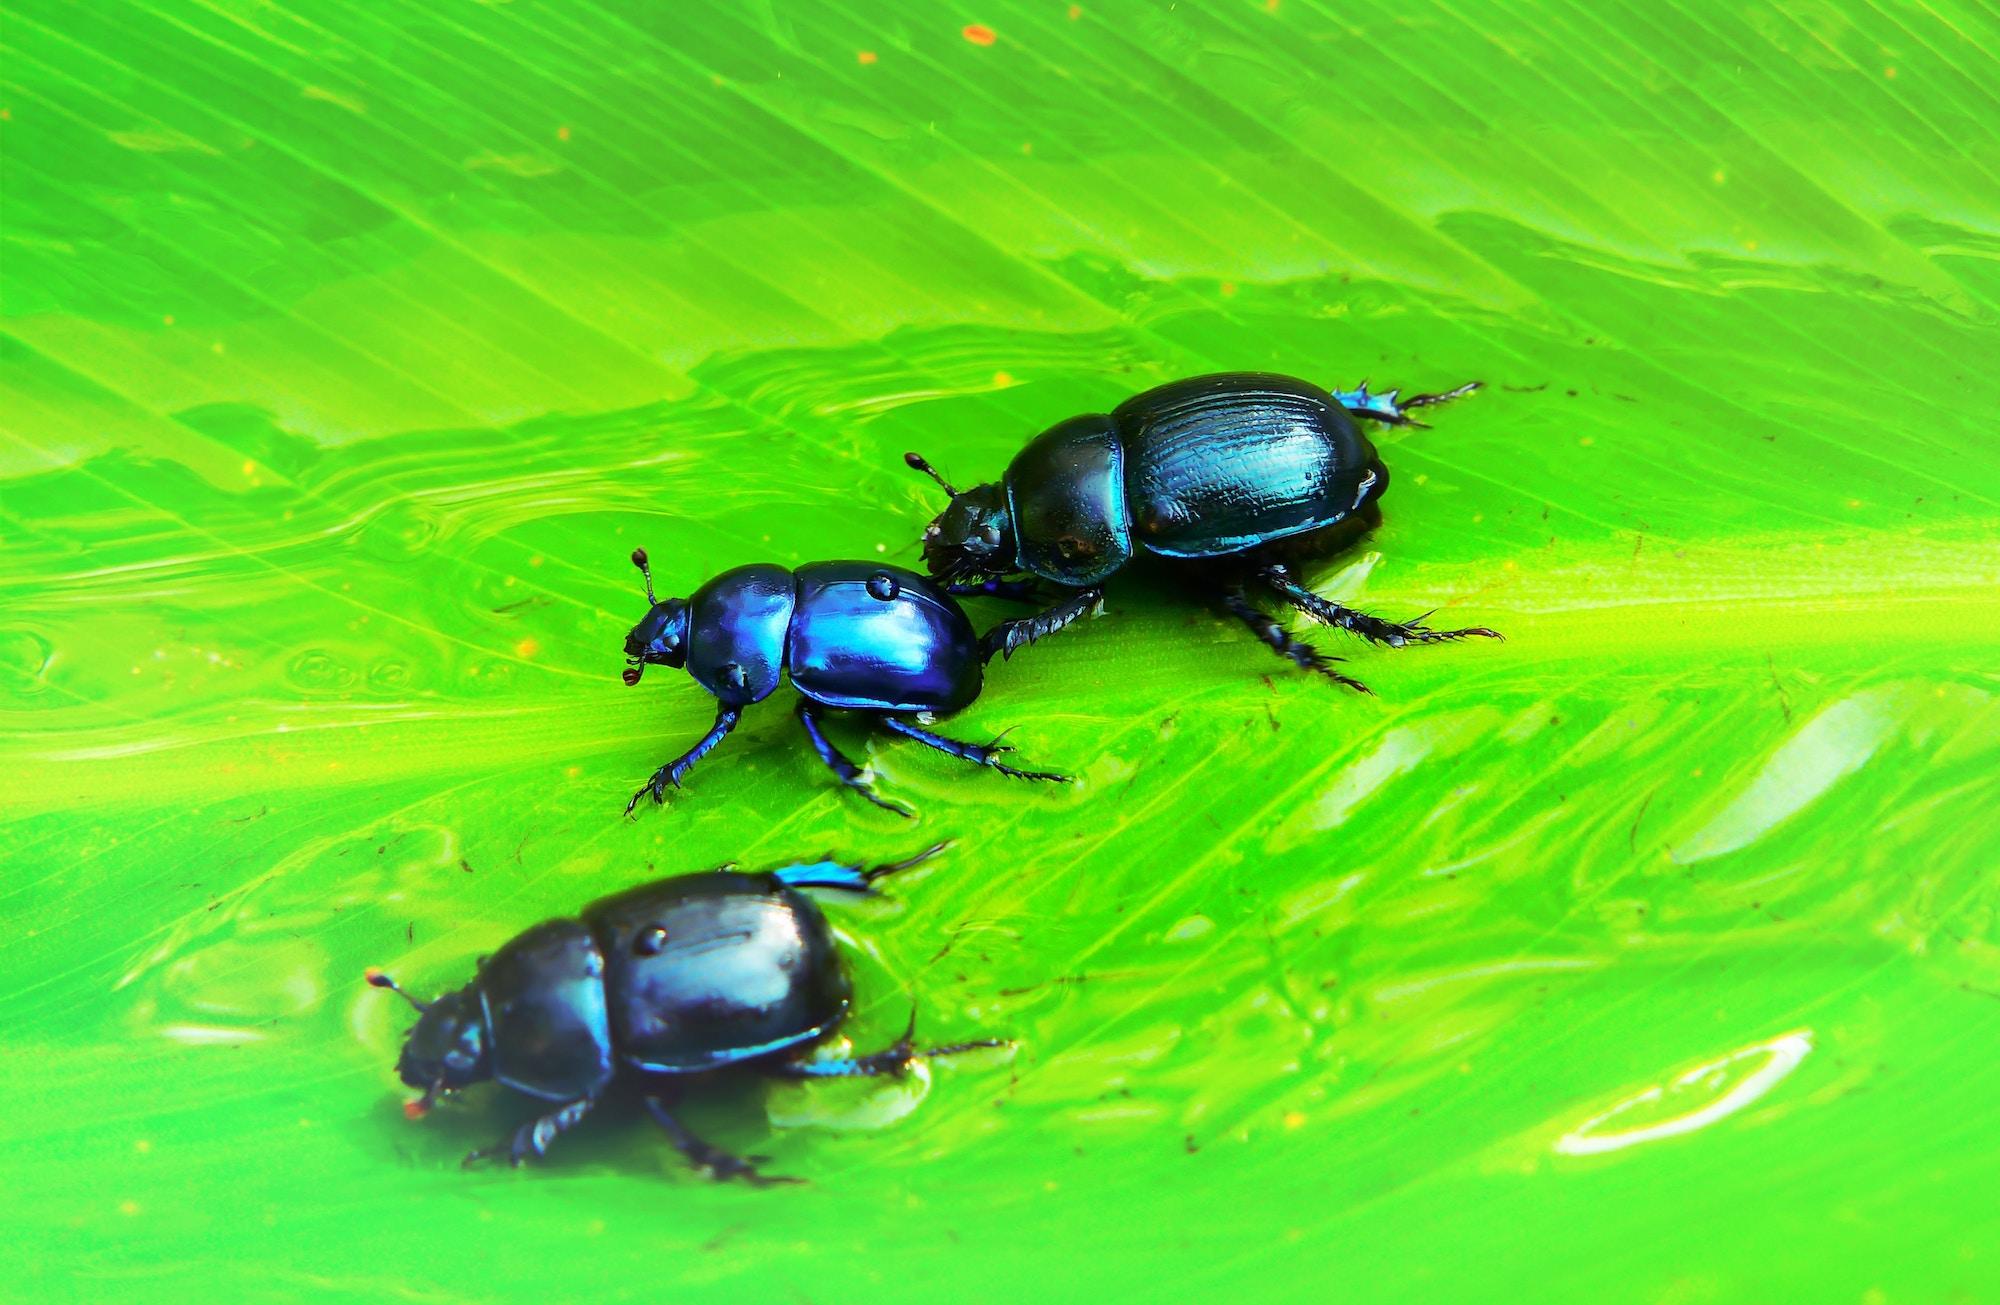 Bakersfield Pest Control Services, #1 Termite Extermination & Pest Control Company, PestX